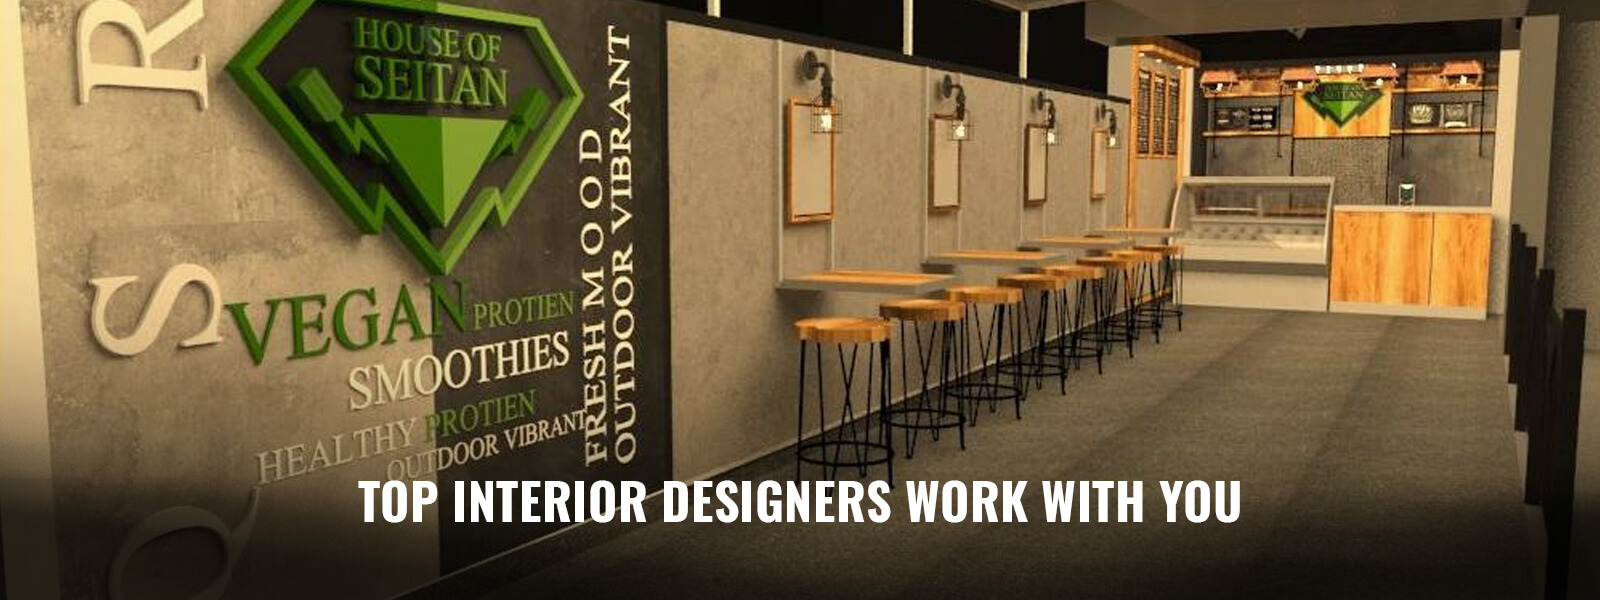 Spacekod Interior Designer Studio In Bangalore Architecture Firms